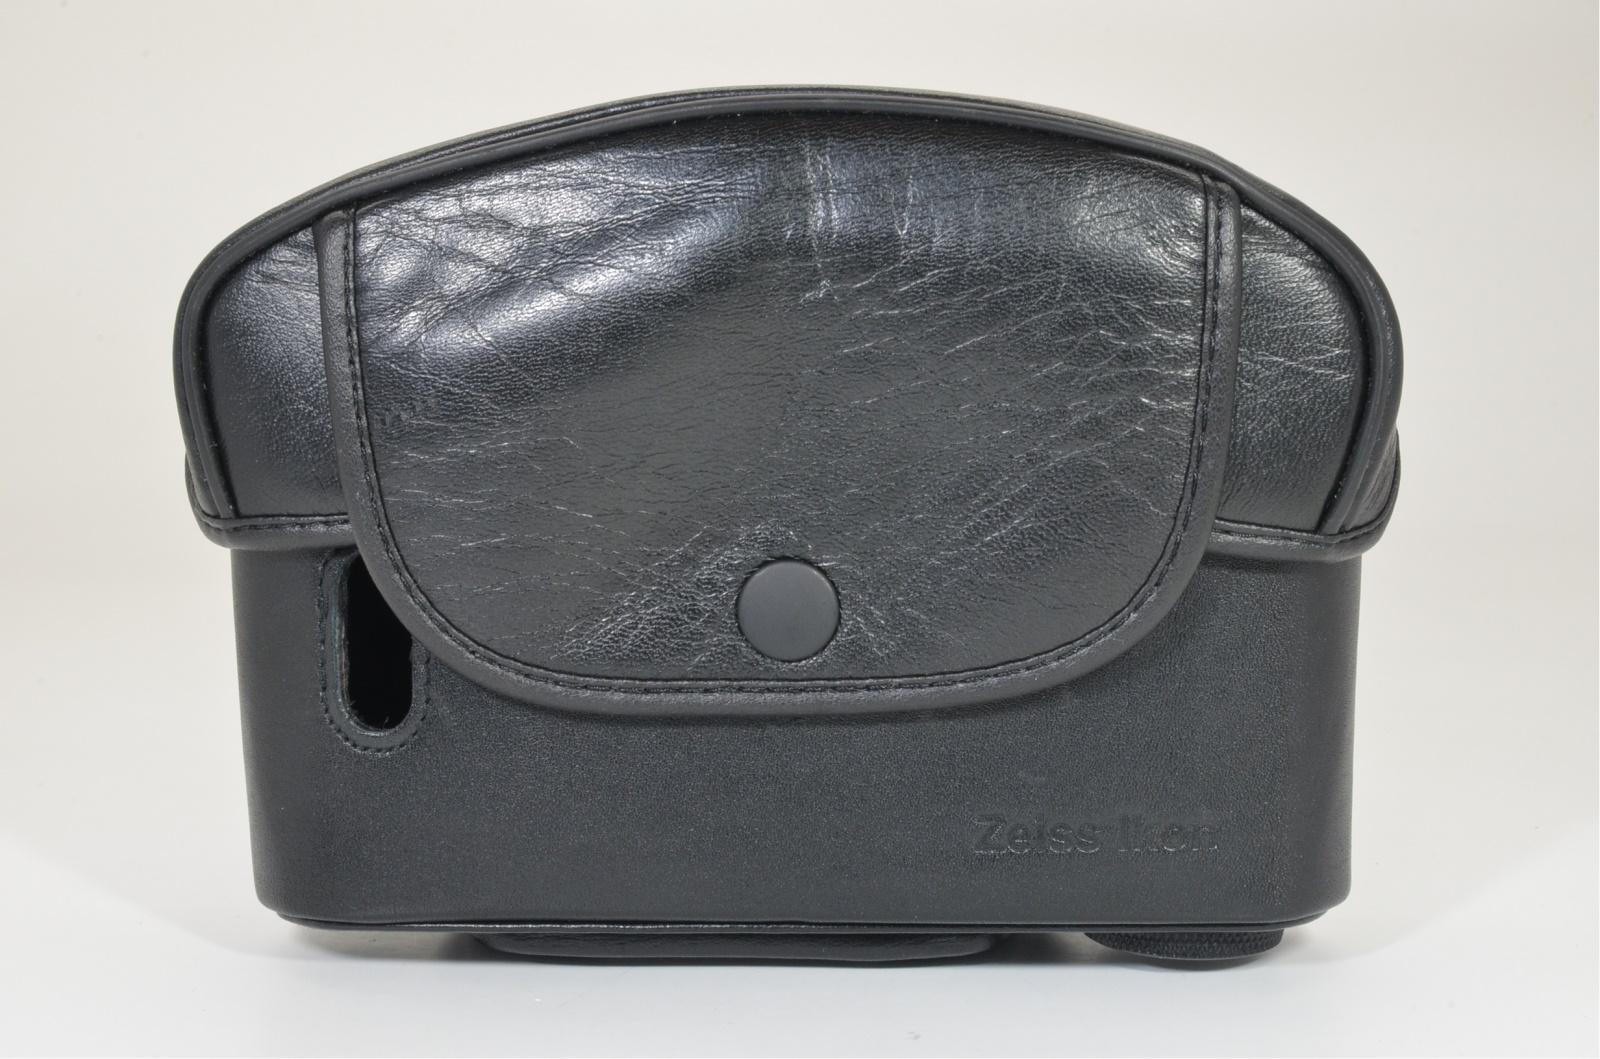 cosina zeiss ikon zm leather camera case semi-hard case from japan